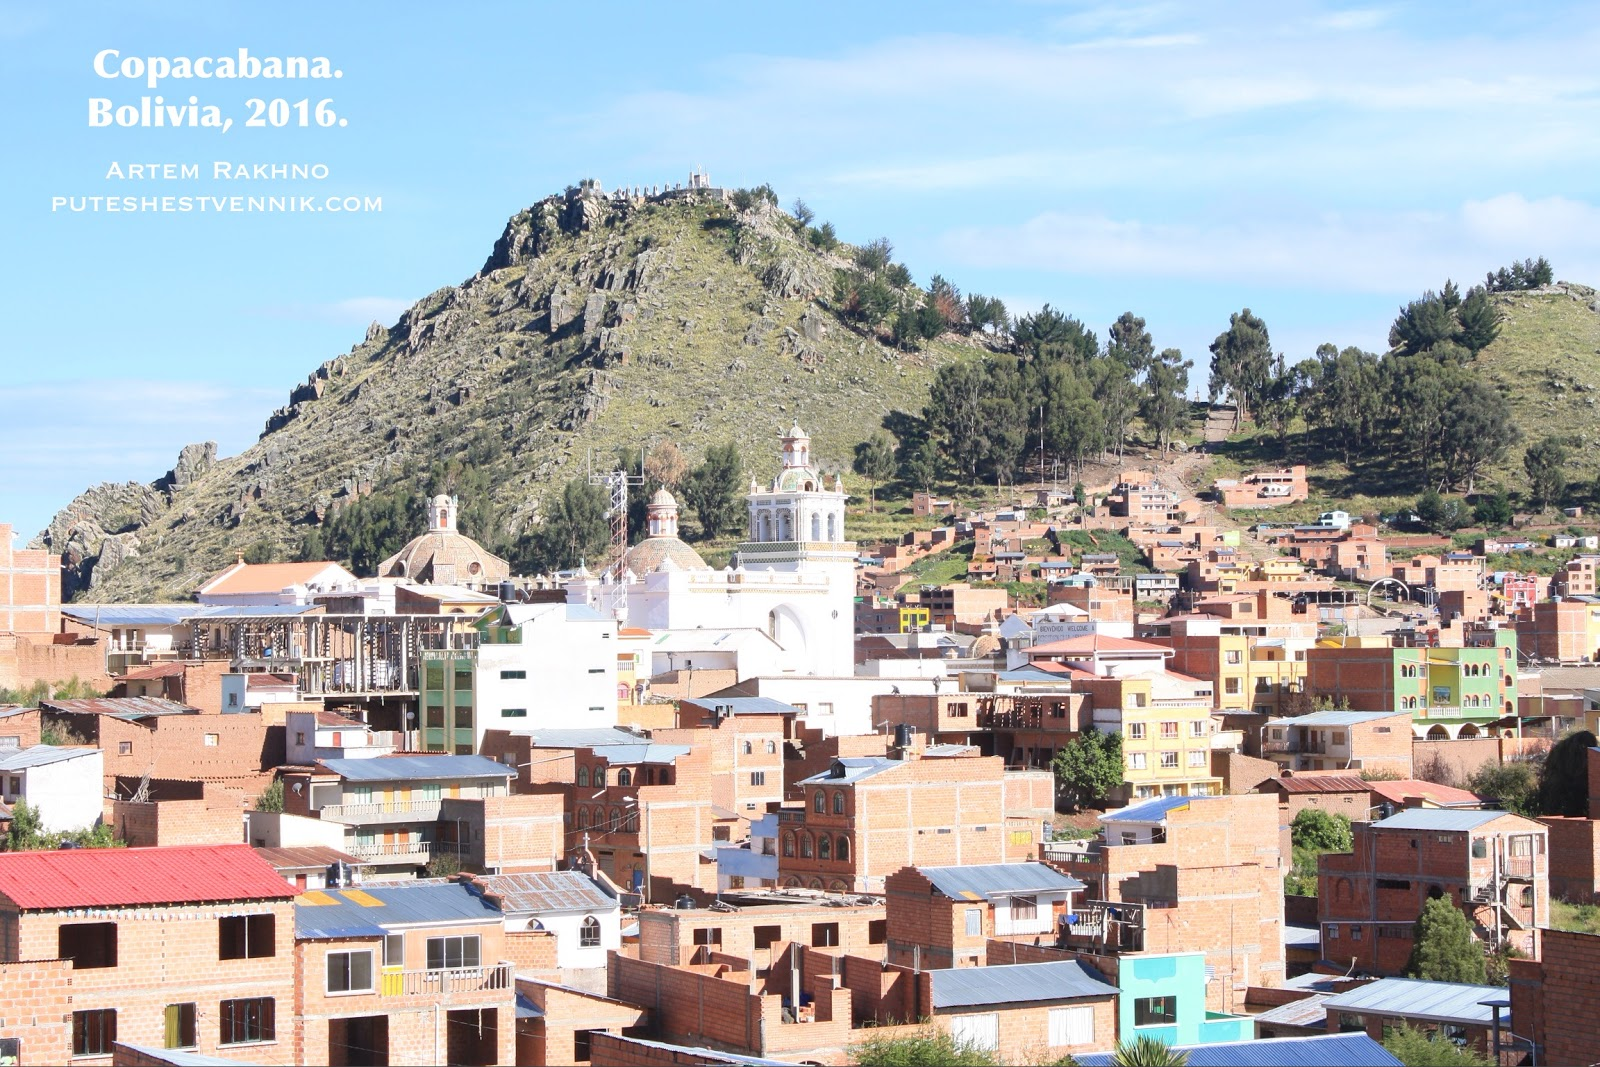 Город Копакабана